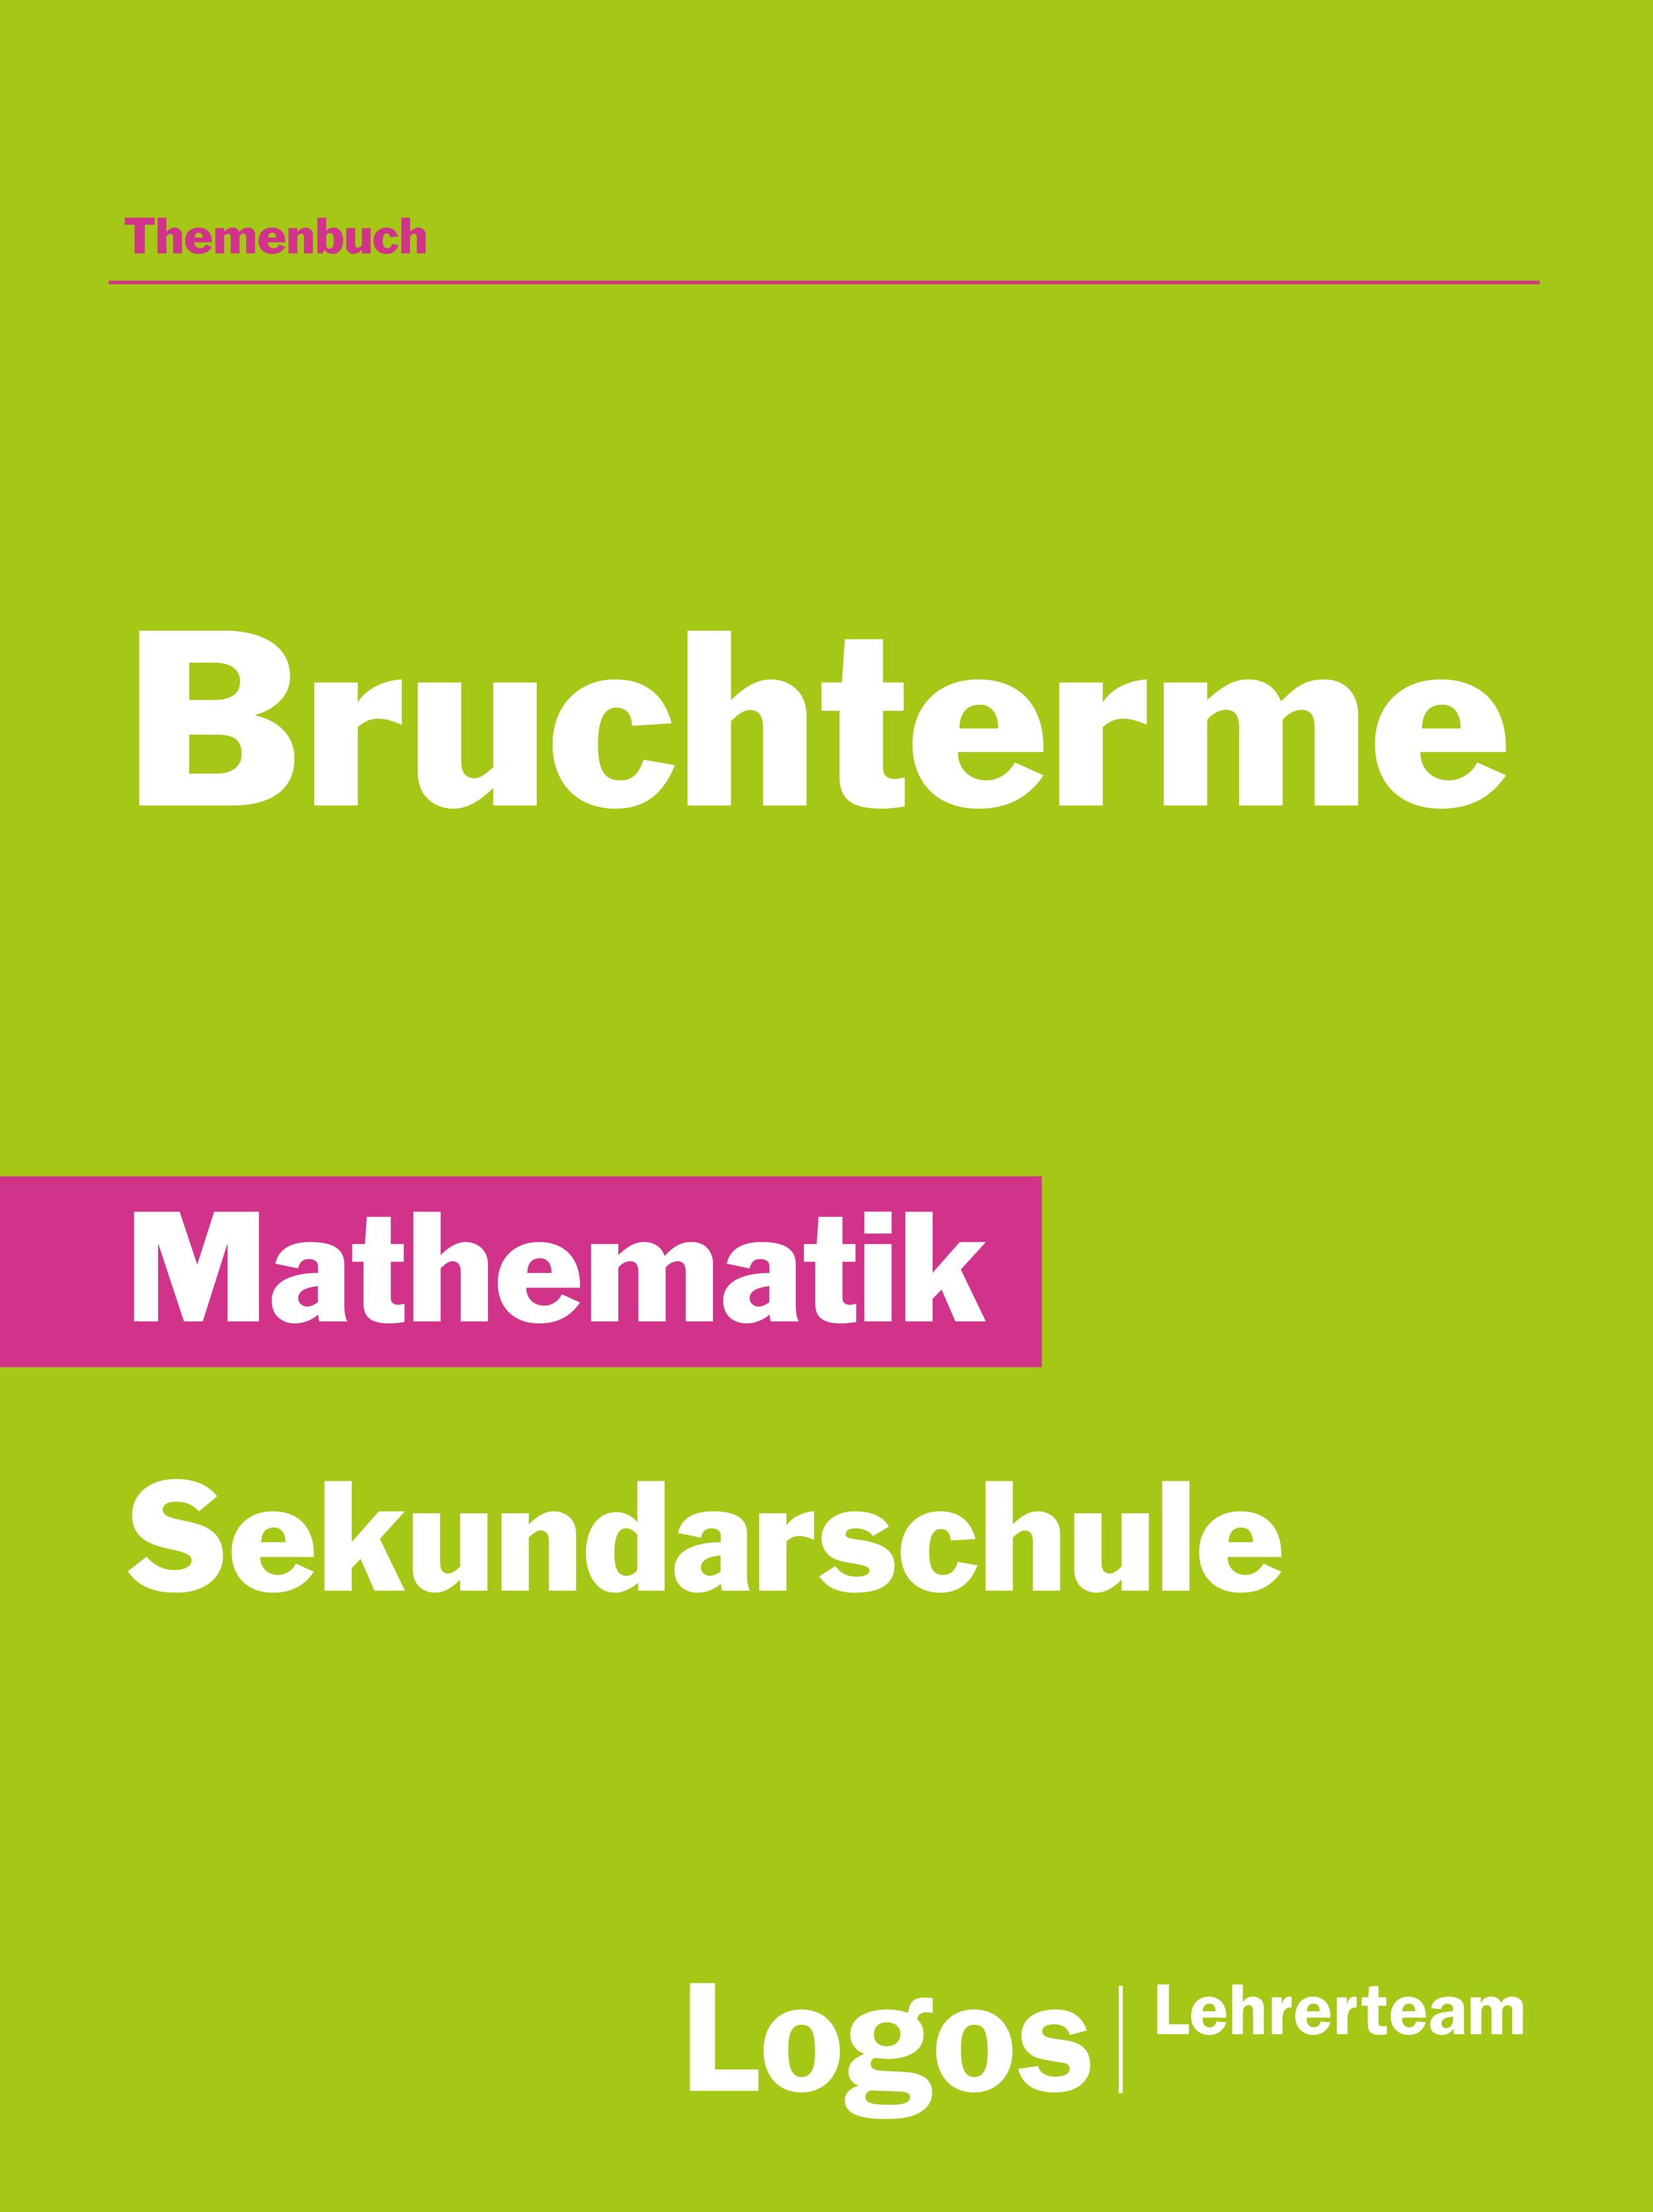 Mathematik Bruchterme - Sekundarschule